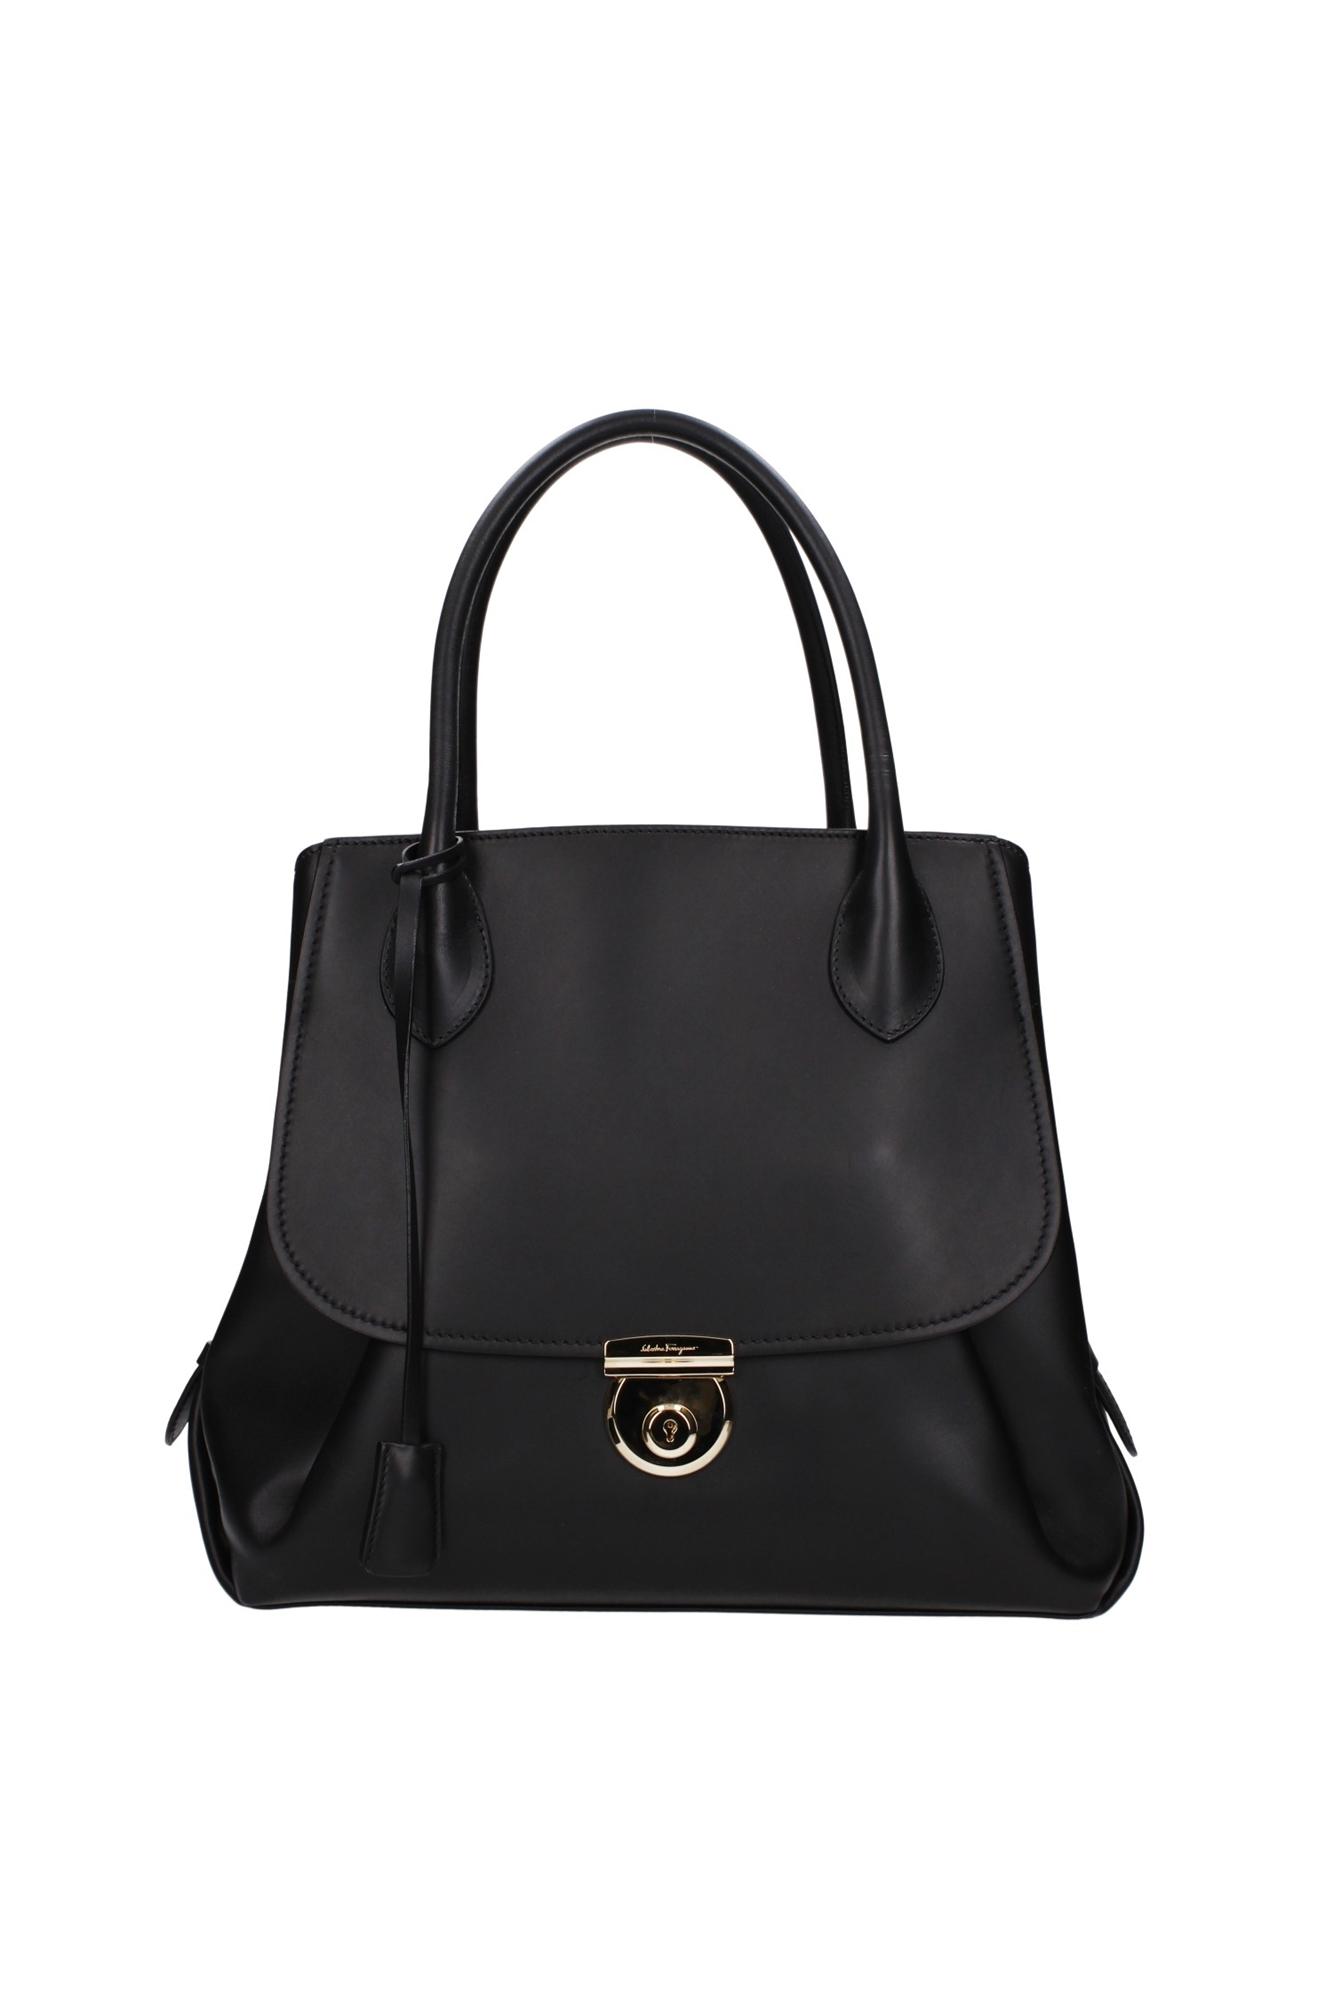 Perfect Salvatore Ferragamo Womens Amelie Shoulder Bag  Wwwteexe